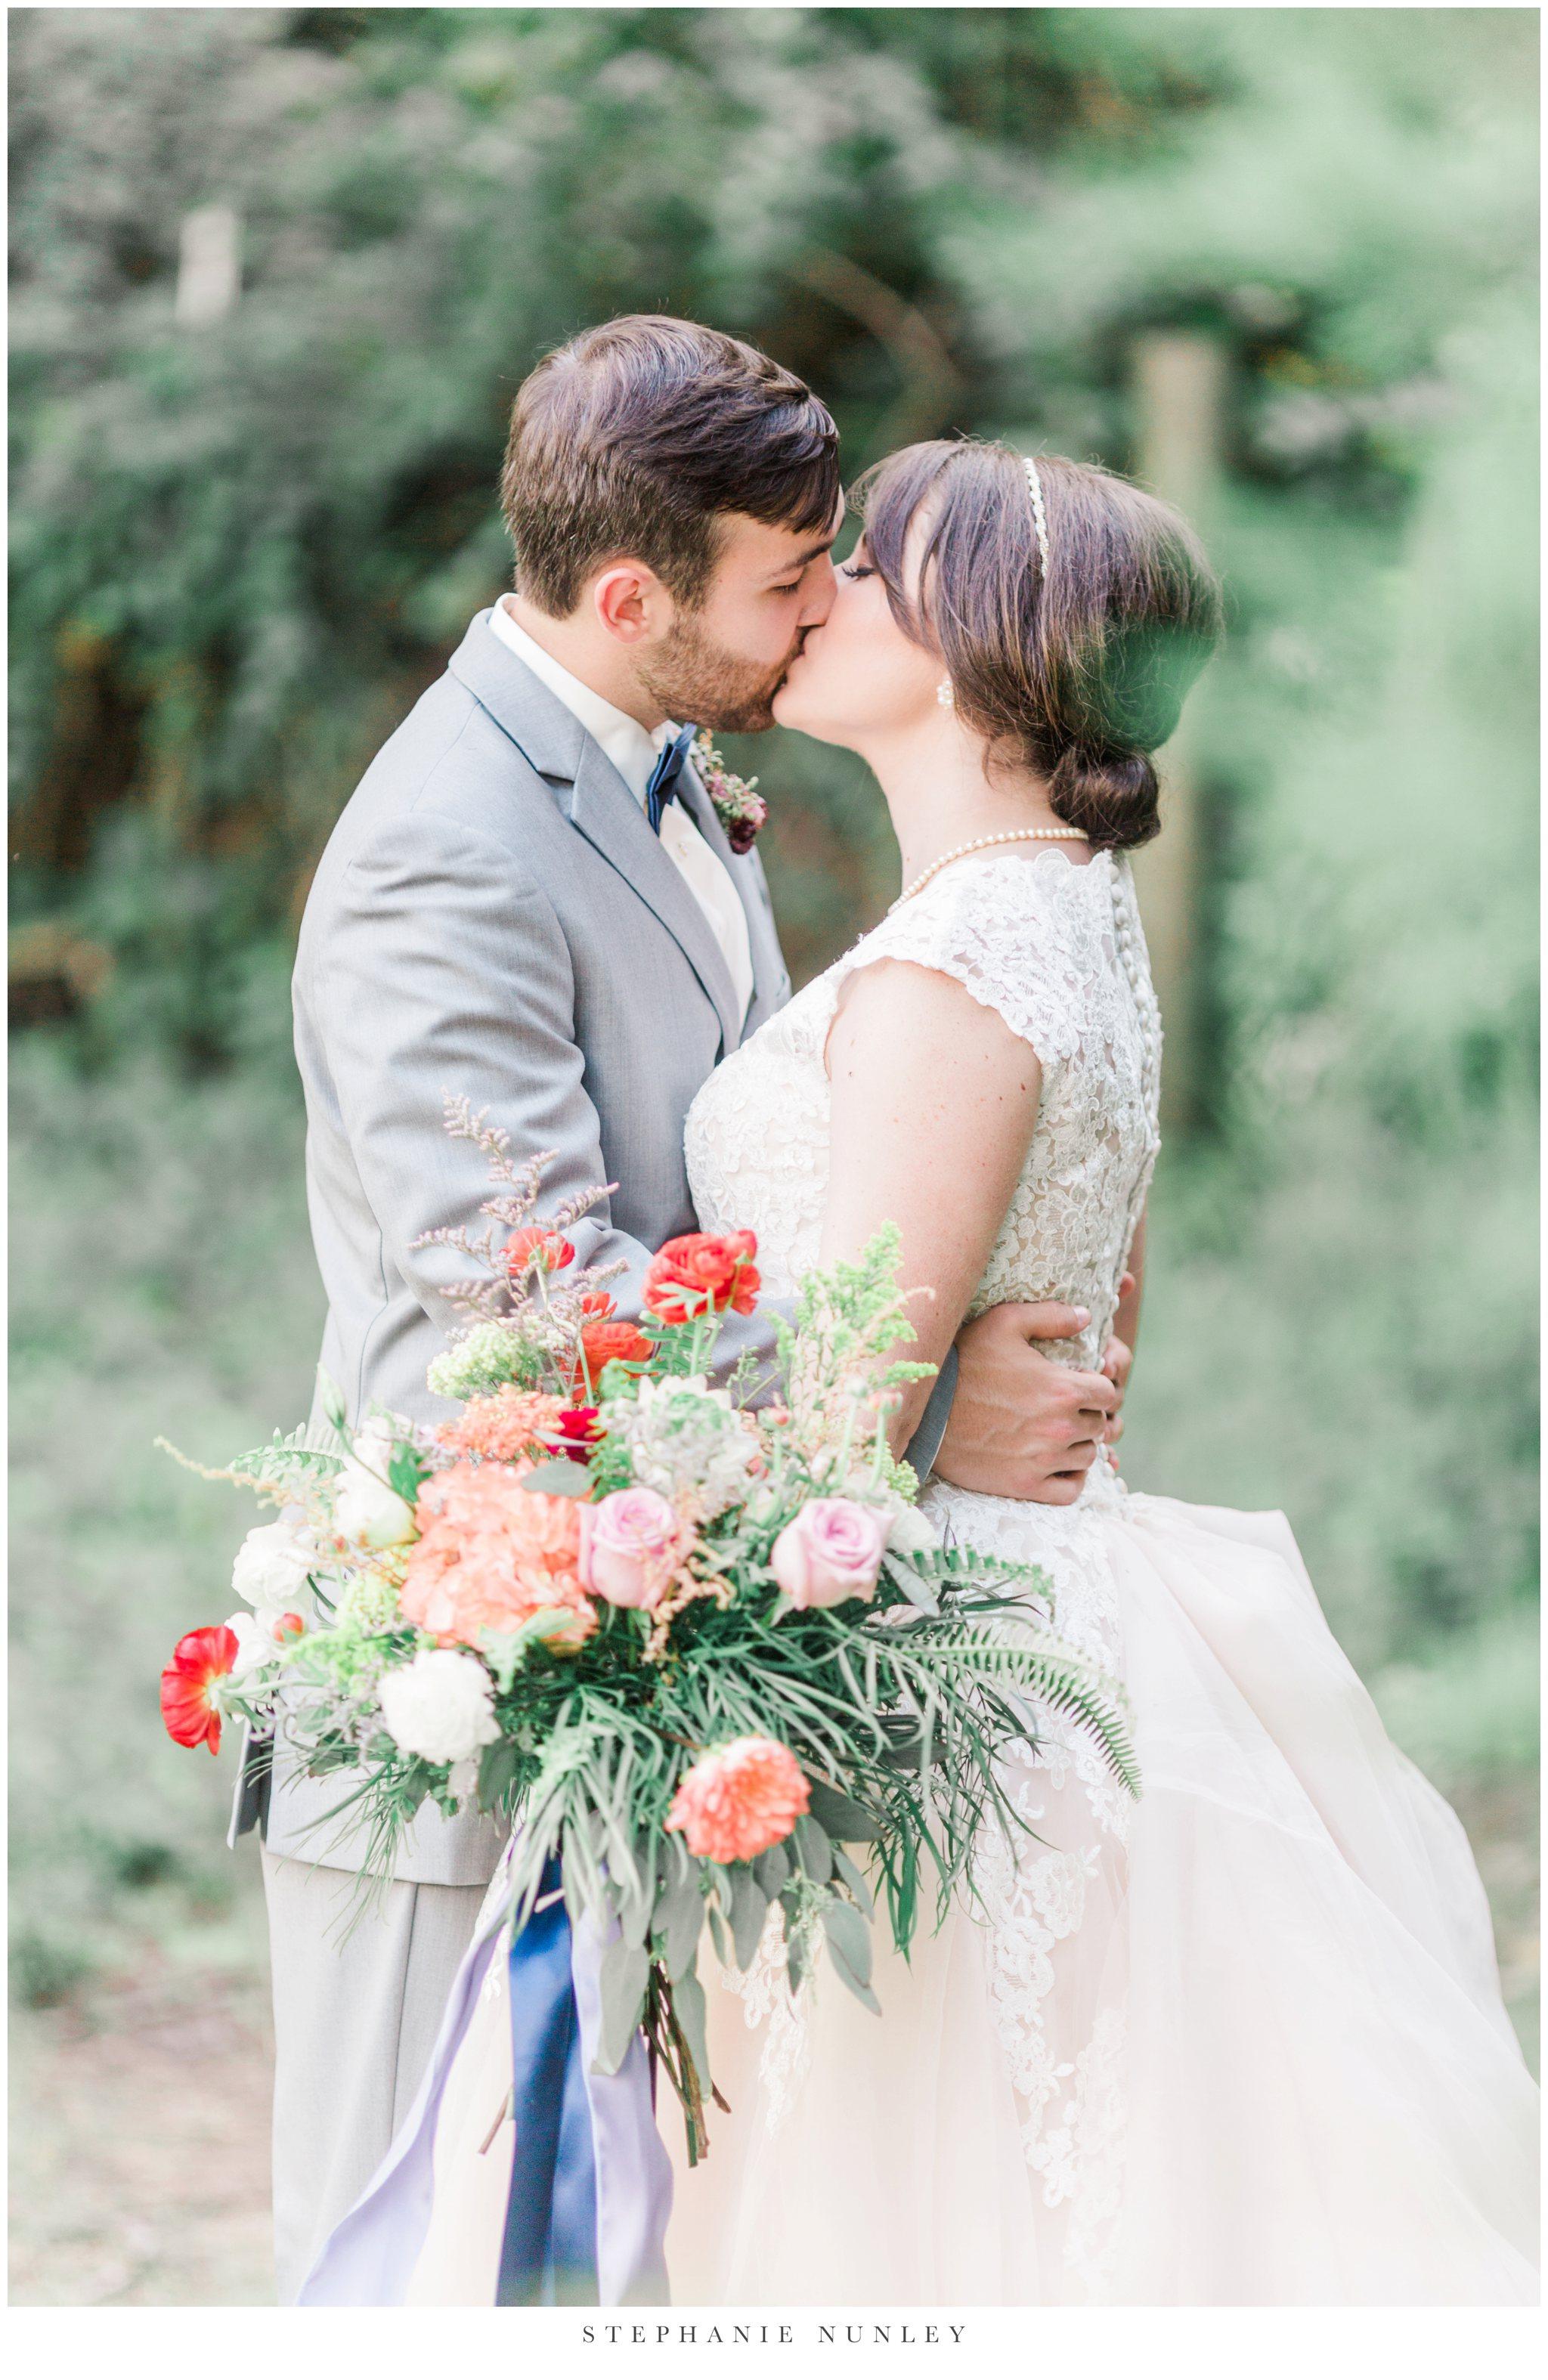 arkansas-wedding-with-lush-wildflower-bouquet-0123.jpg